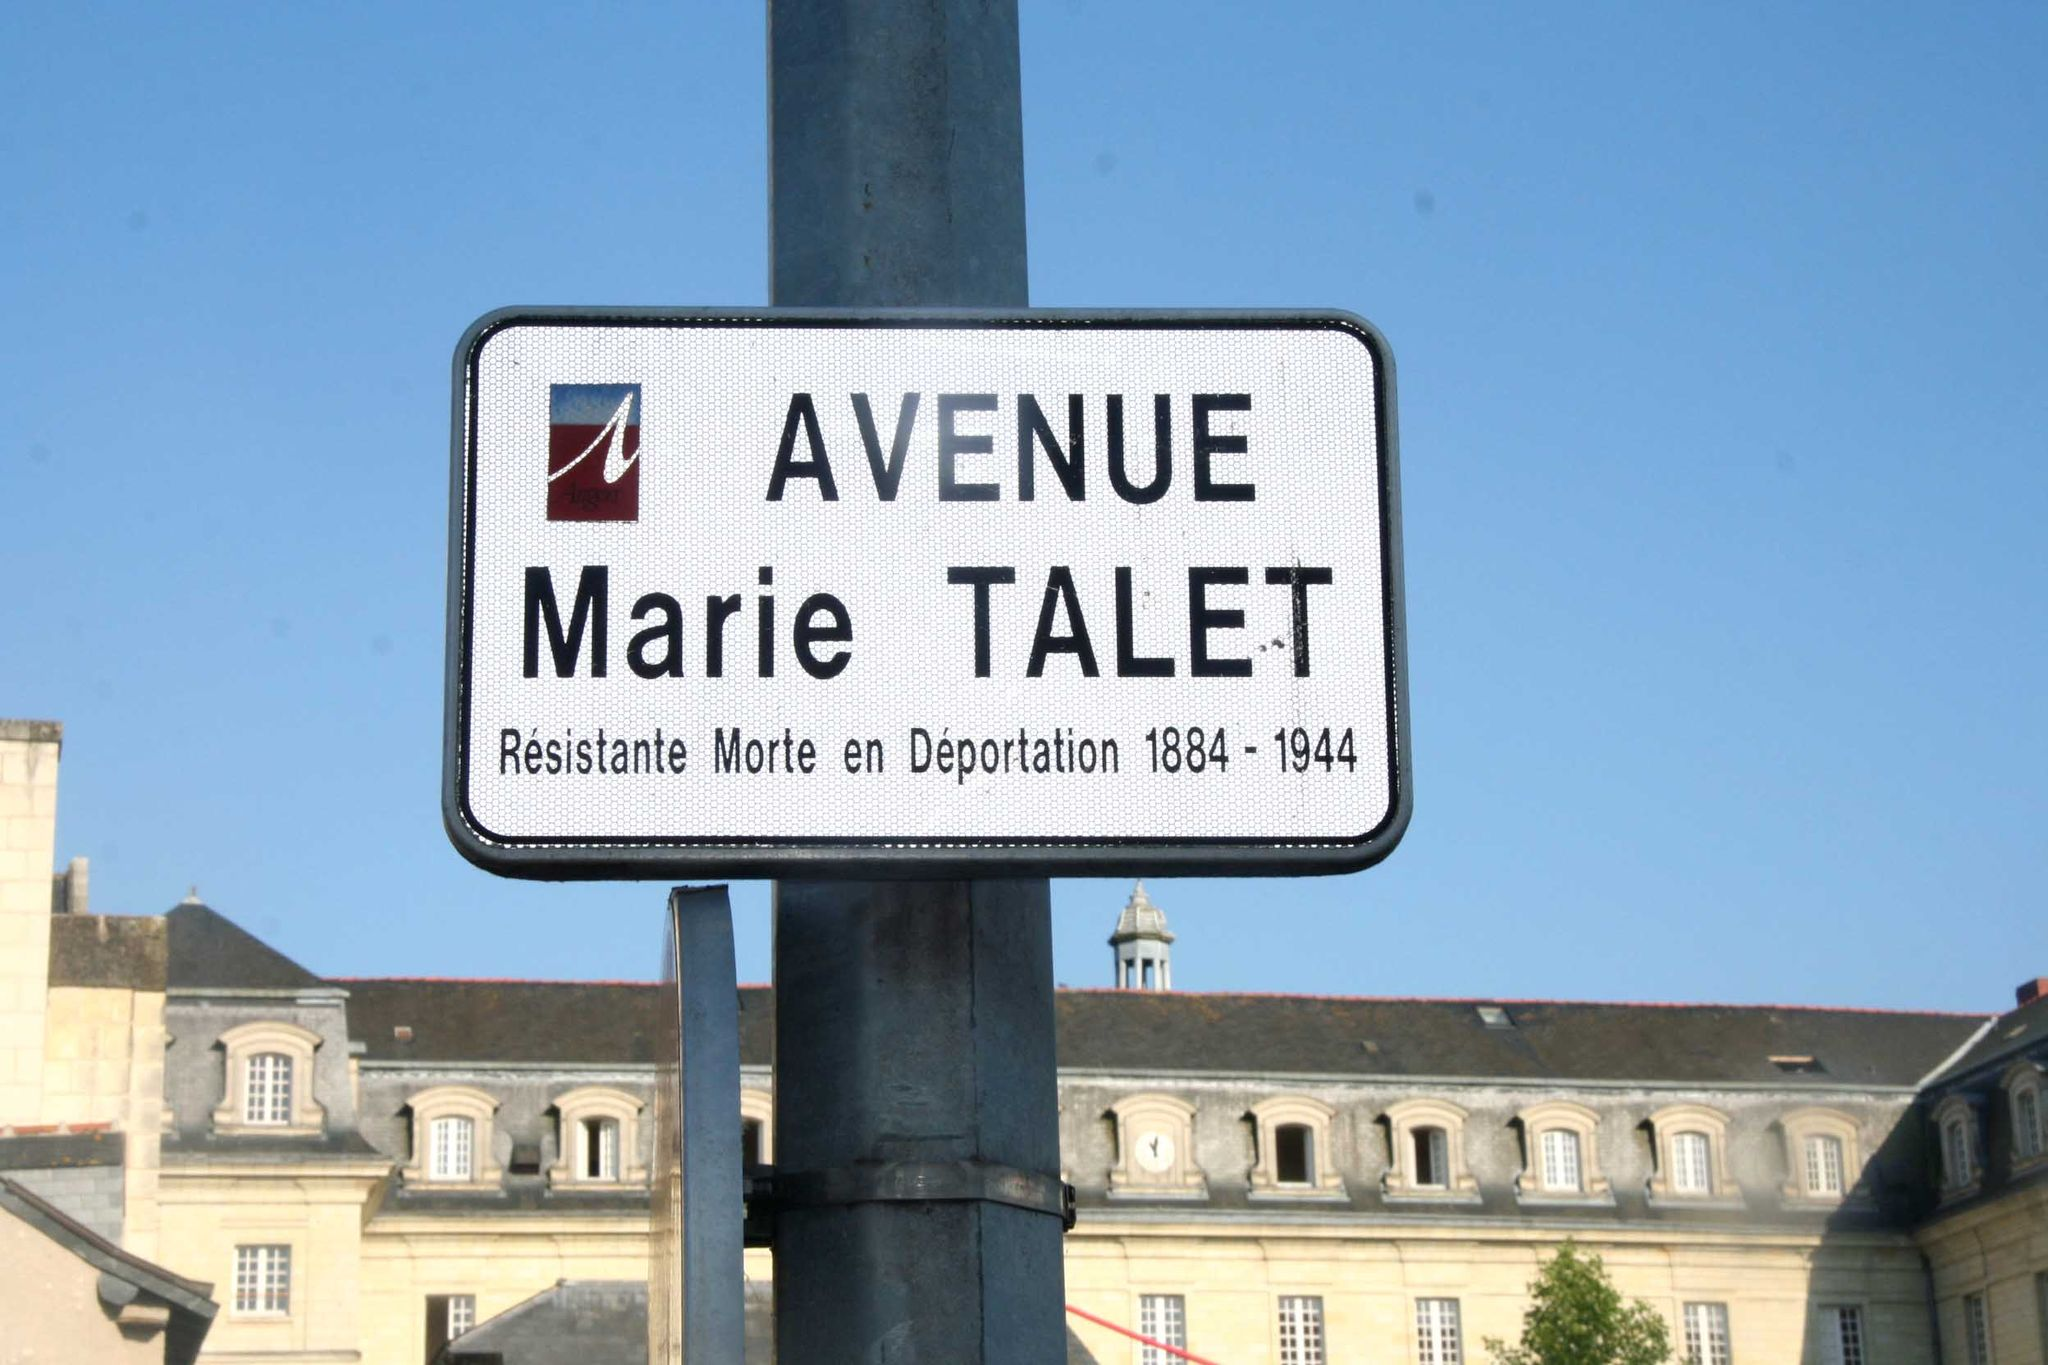 Marie TALET 034